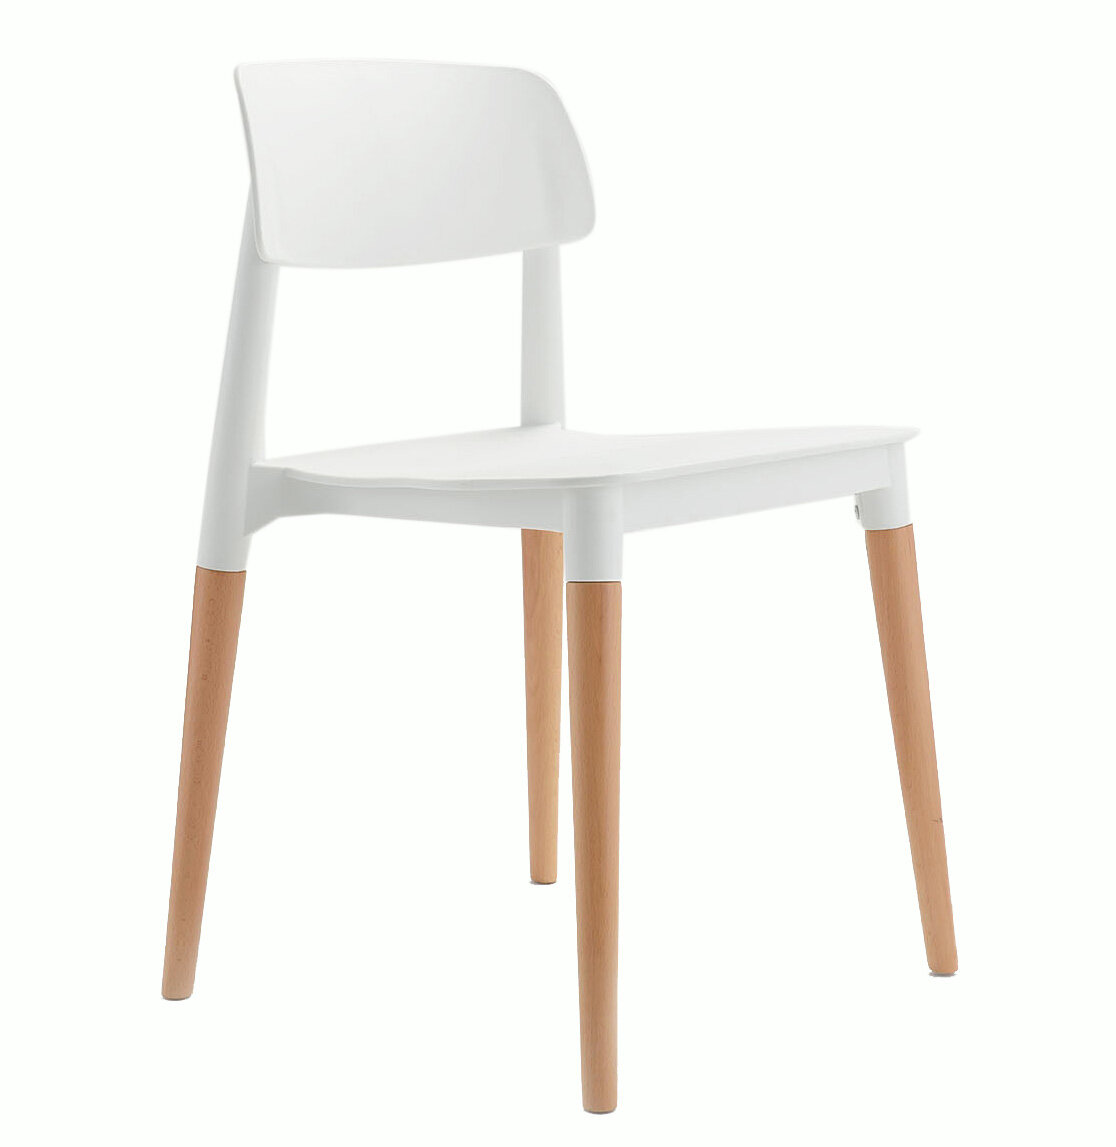 Bel dining chair reviews allmodern